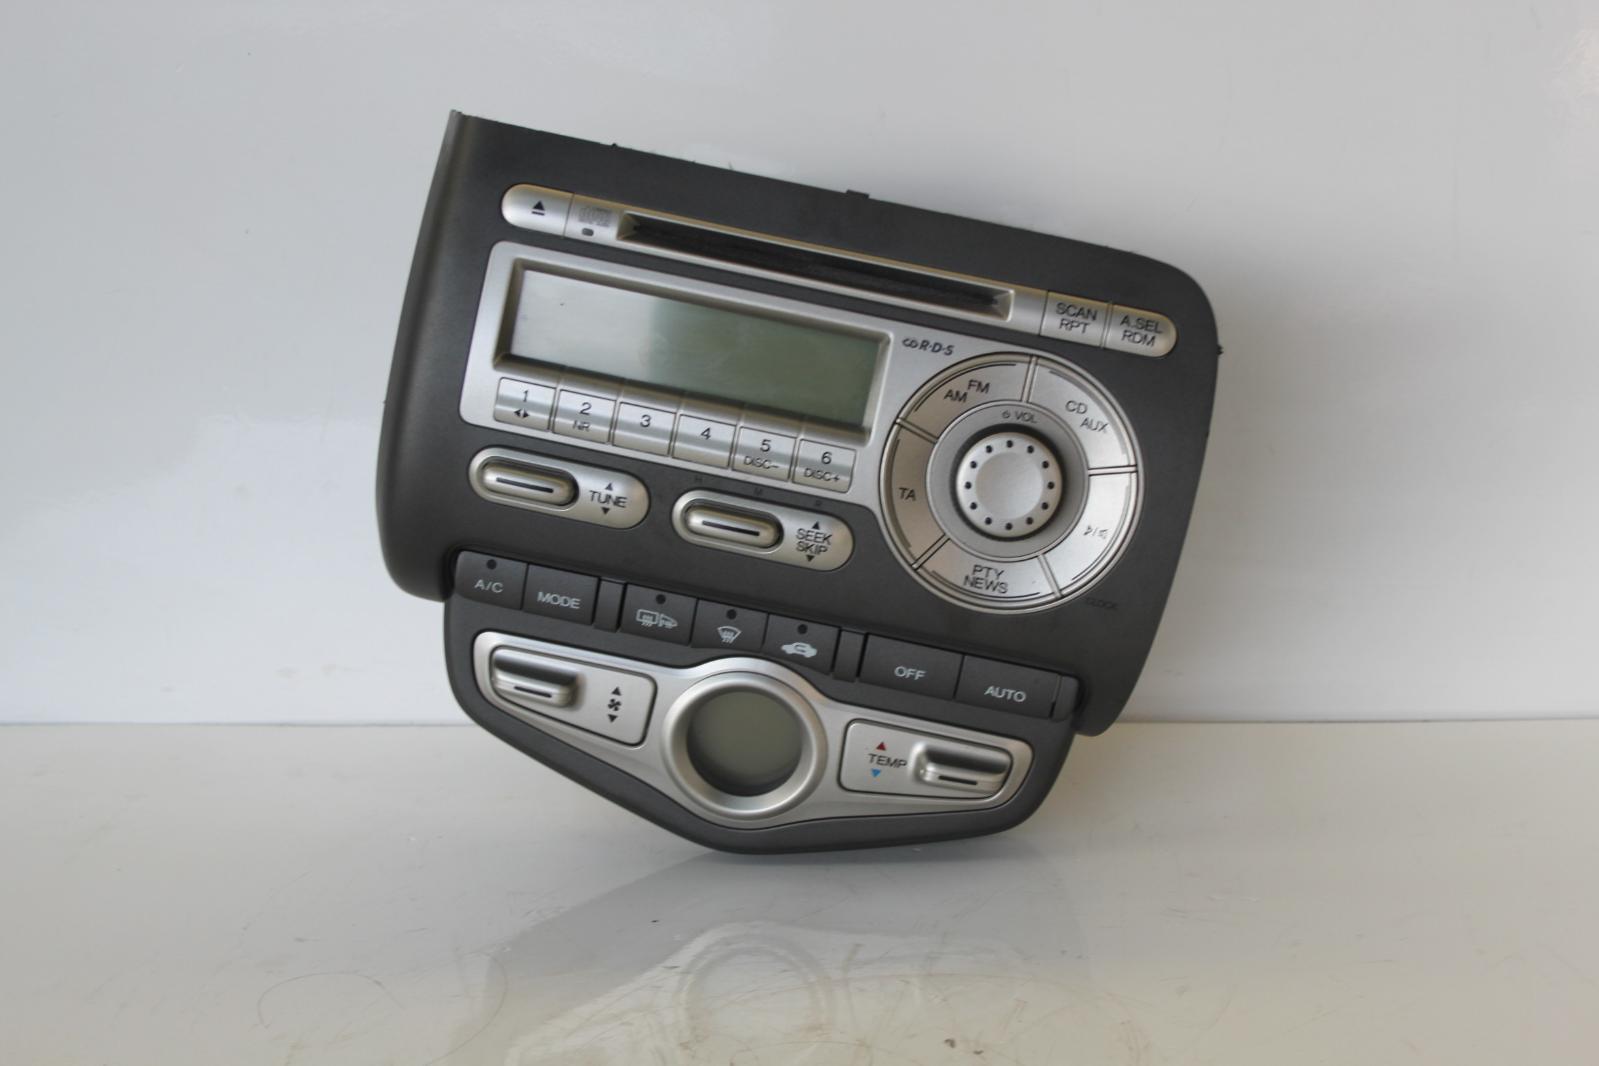 2008 honda jazz stereo radio cd head unit 50106923 tag. Black Bedroom Furniture Sets. Home Design Ideas